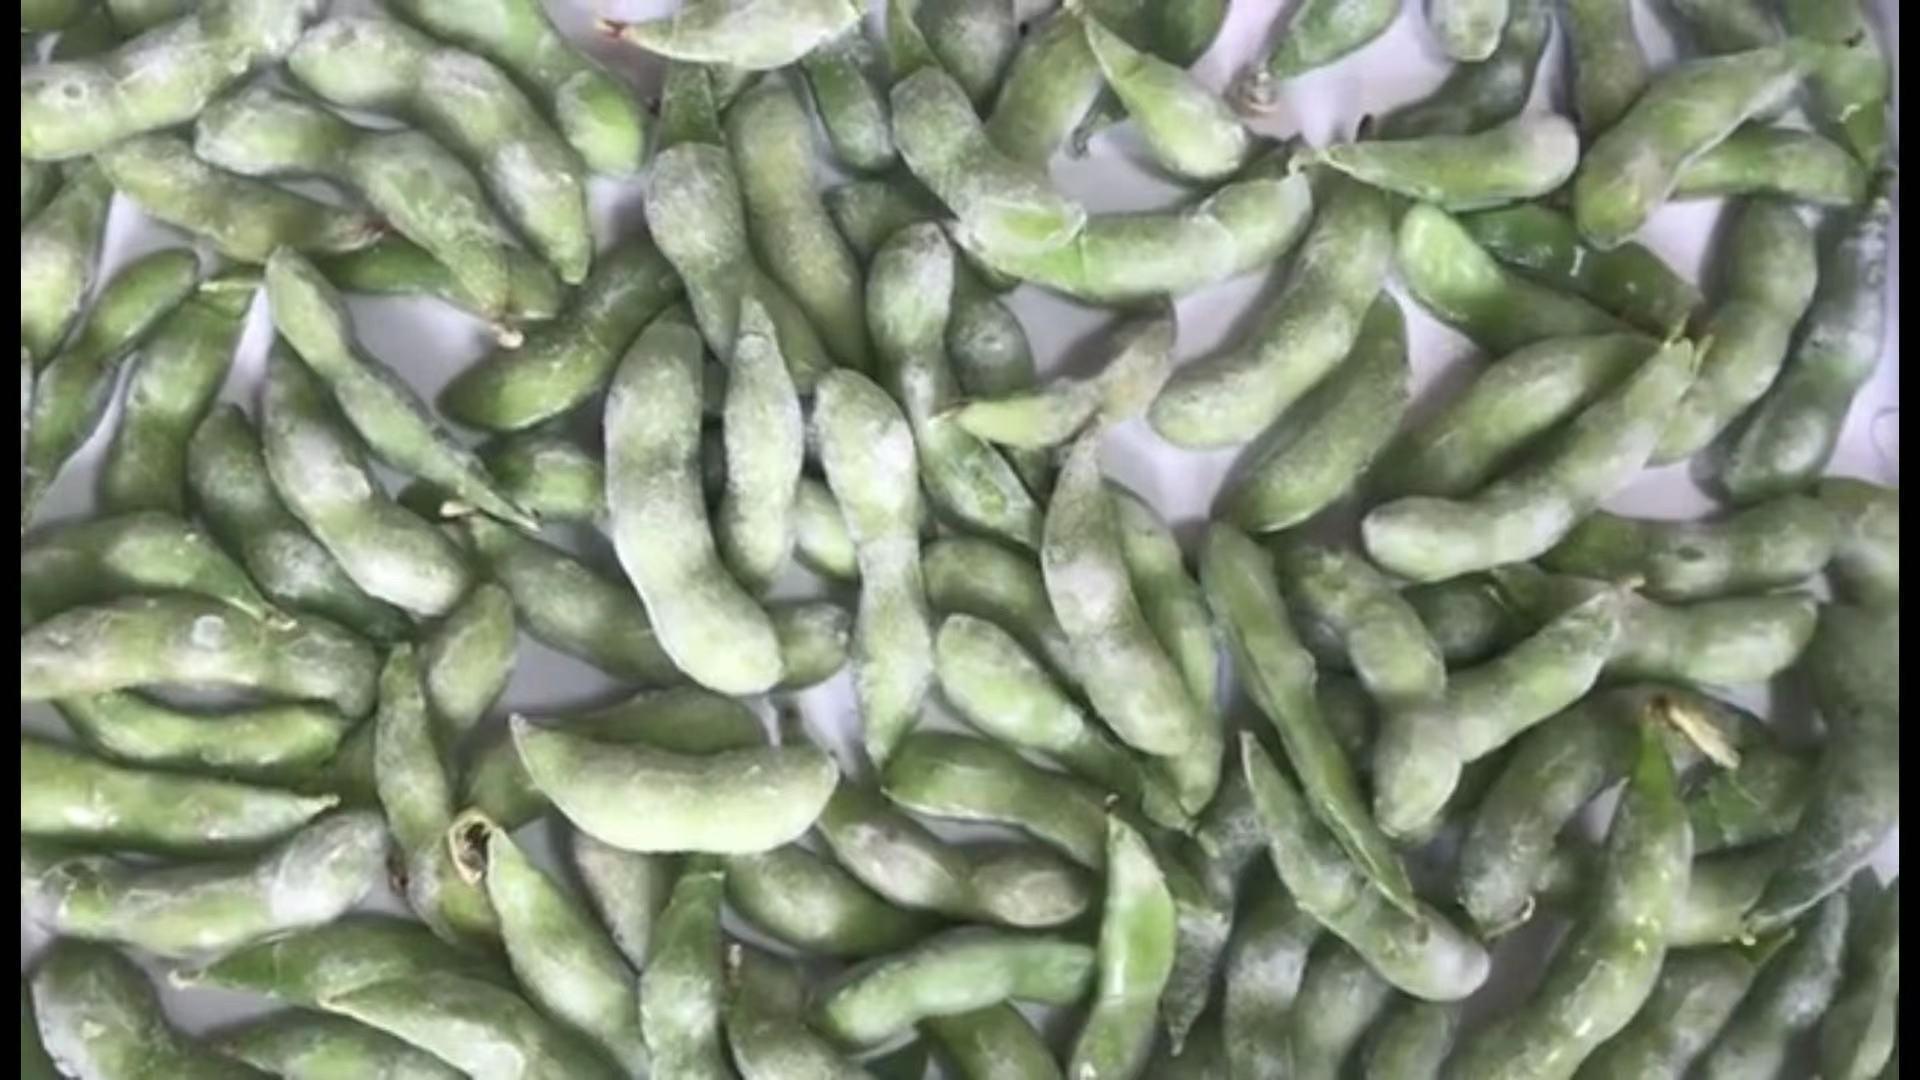 IQF Glazed Green Soybeans,IQF Glazed Edamame,IQF Glazed Soya Beans 5